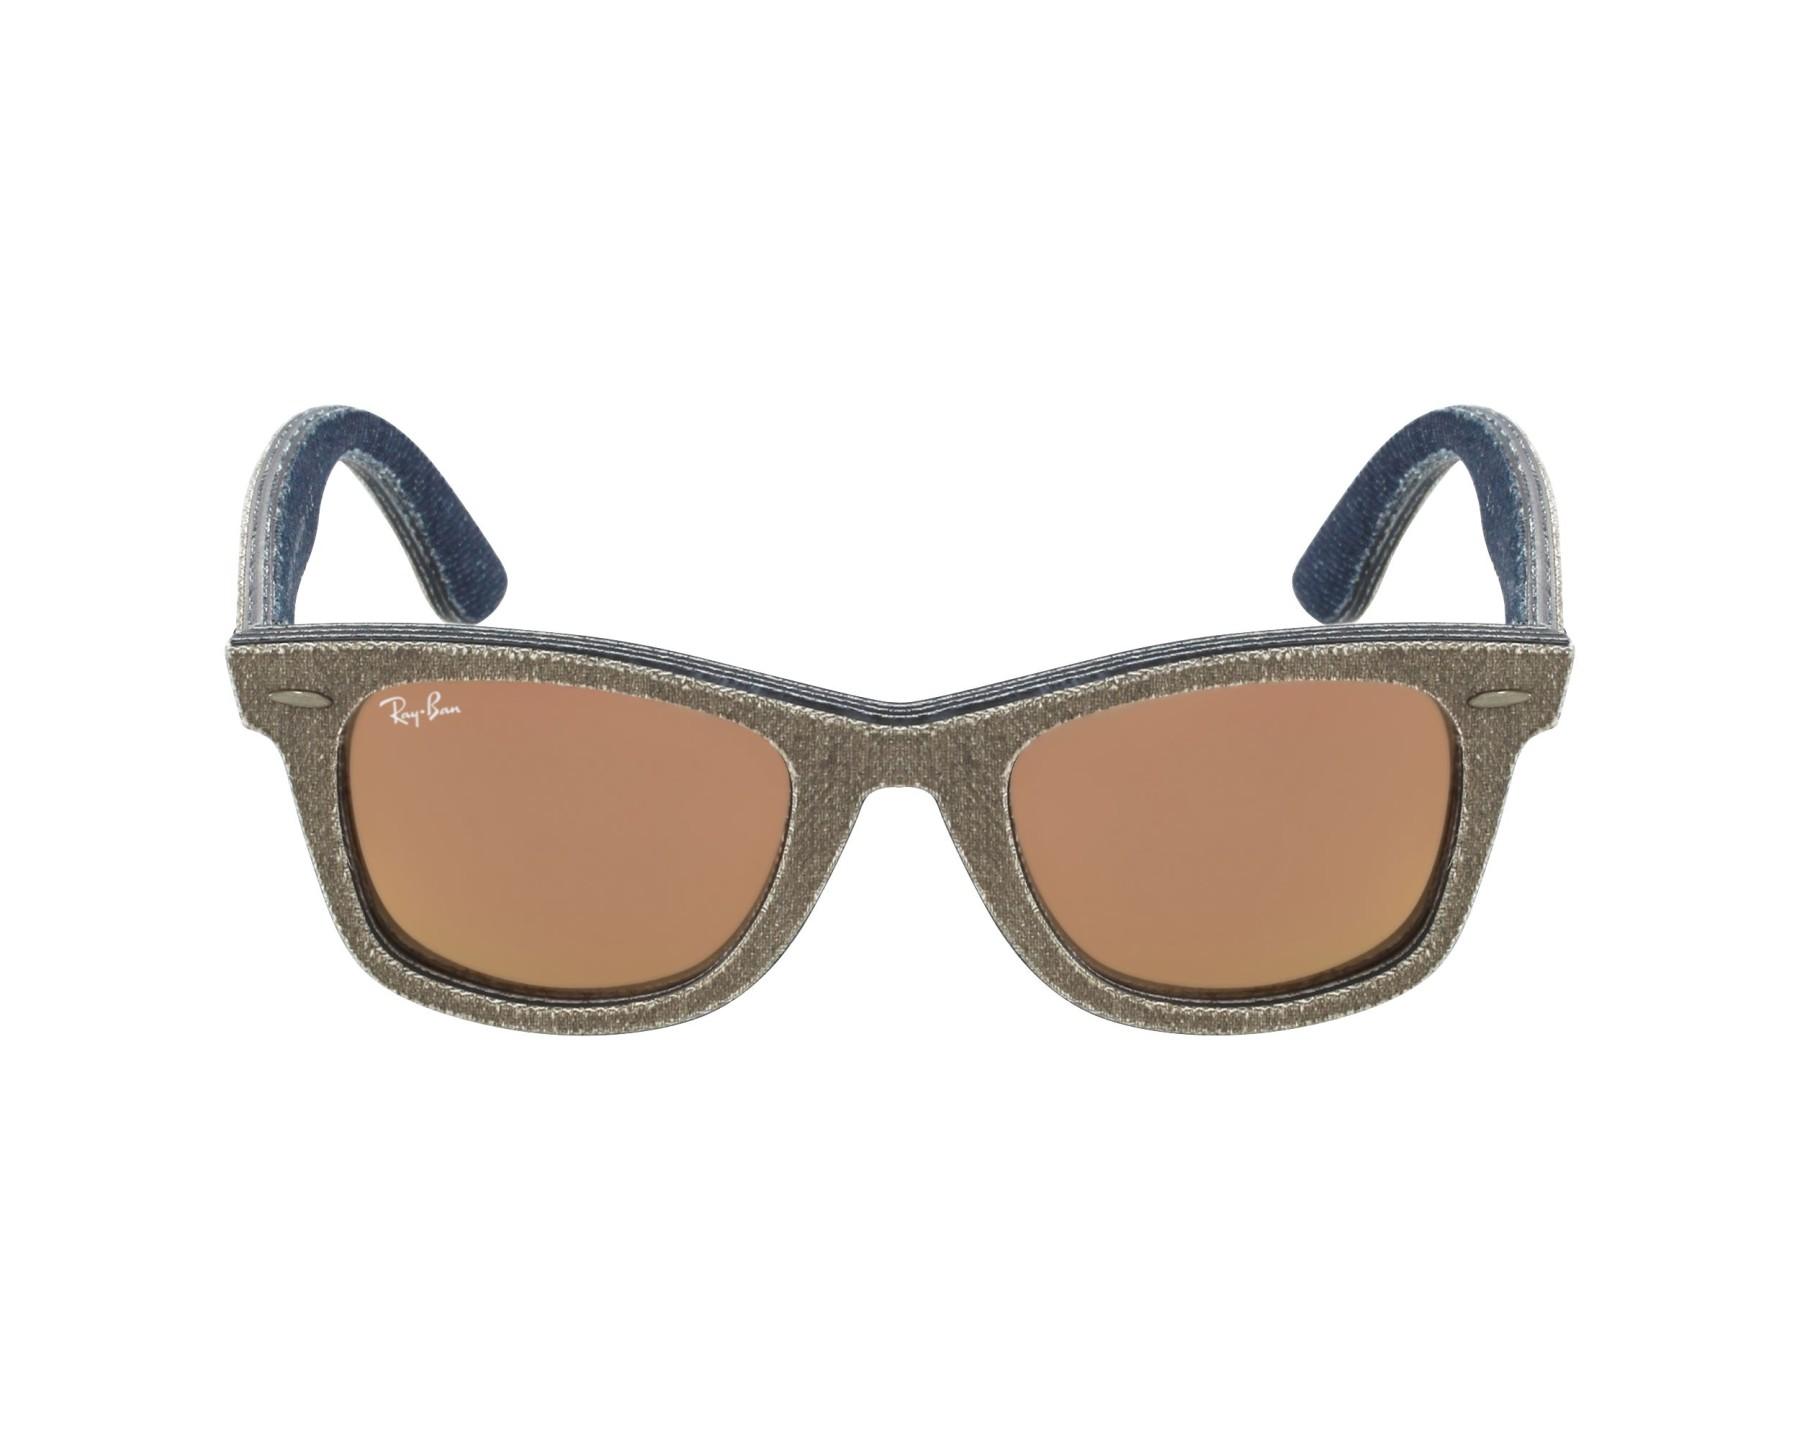 Glasses Frame Tighteners : Ray Ban sunglasses Wayfarer RB2140 1193Z2 50 Visionet